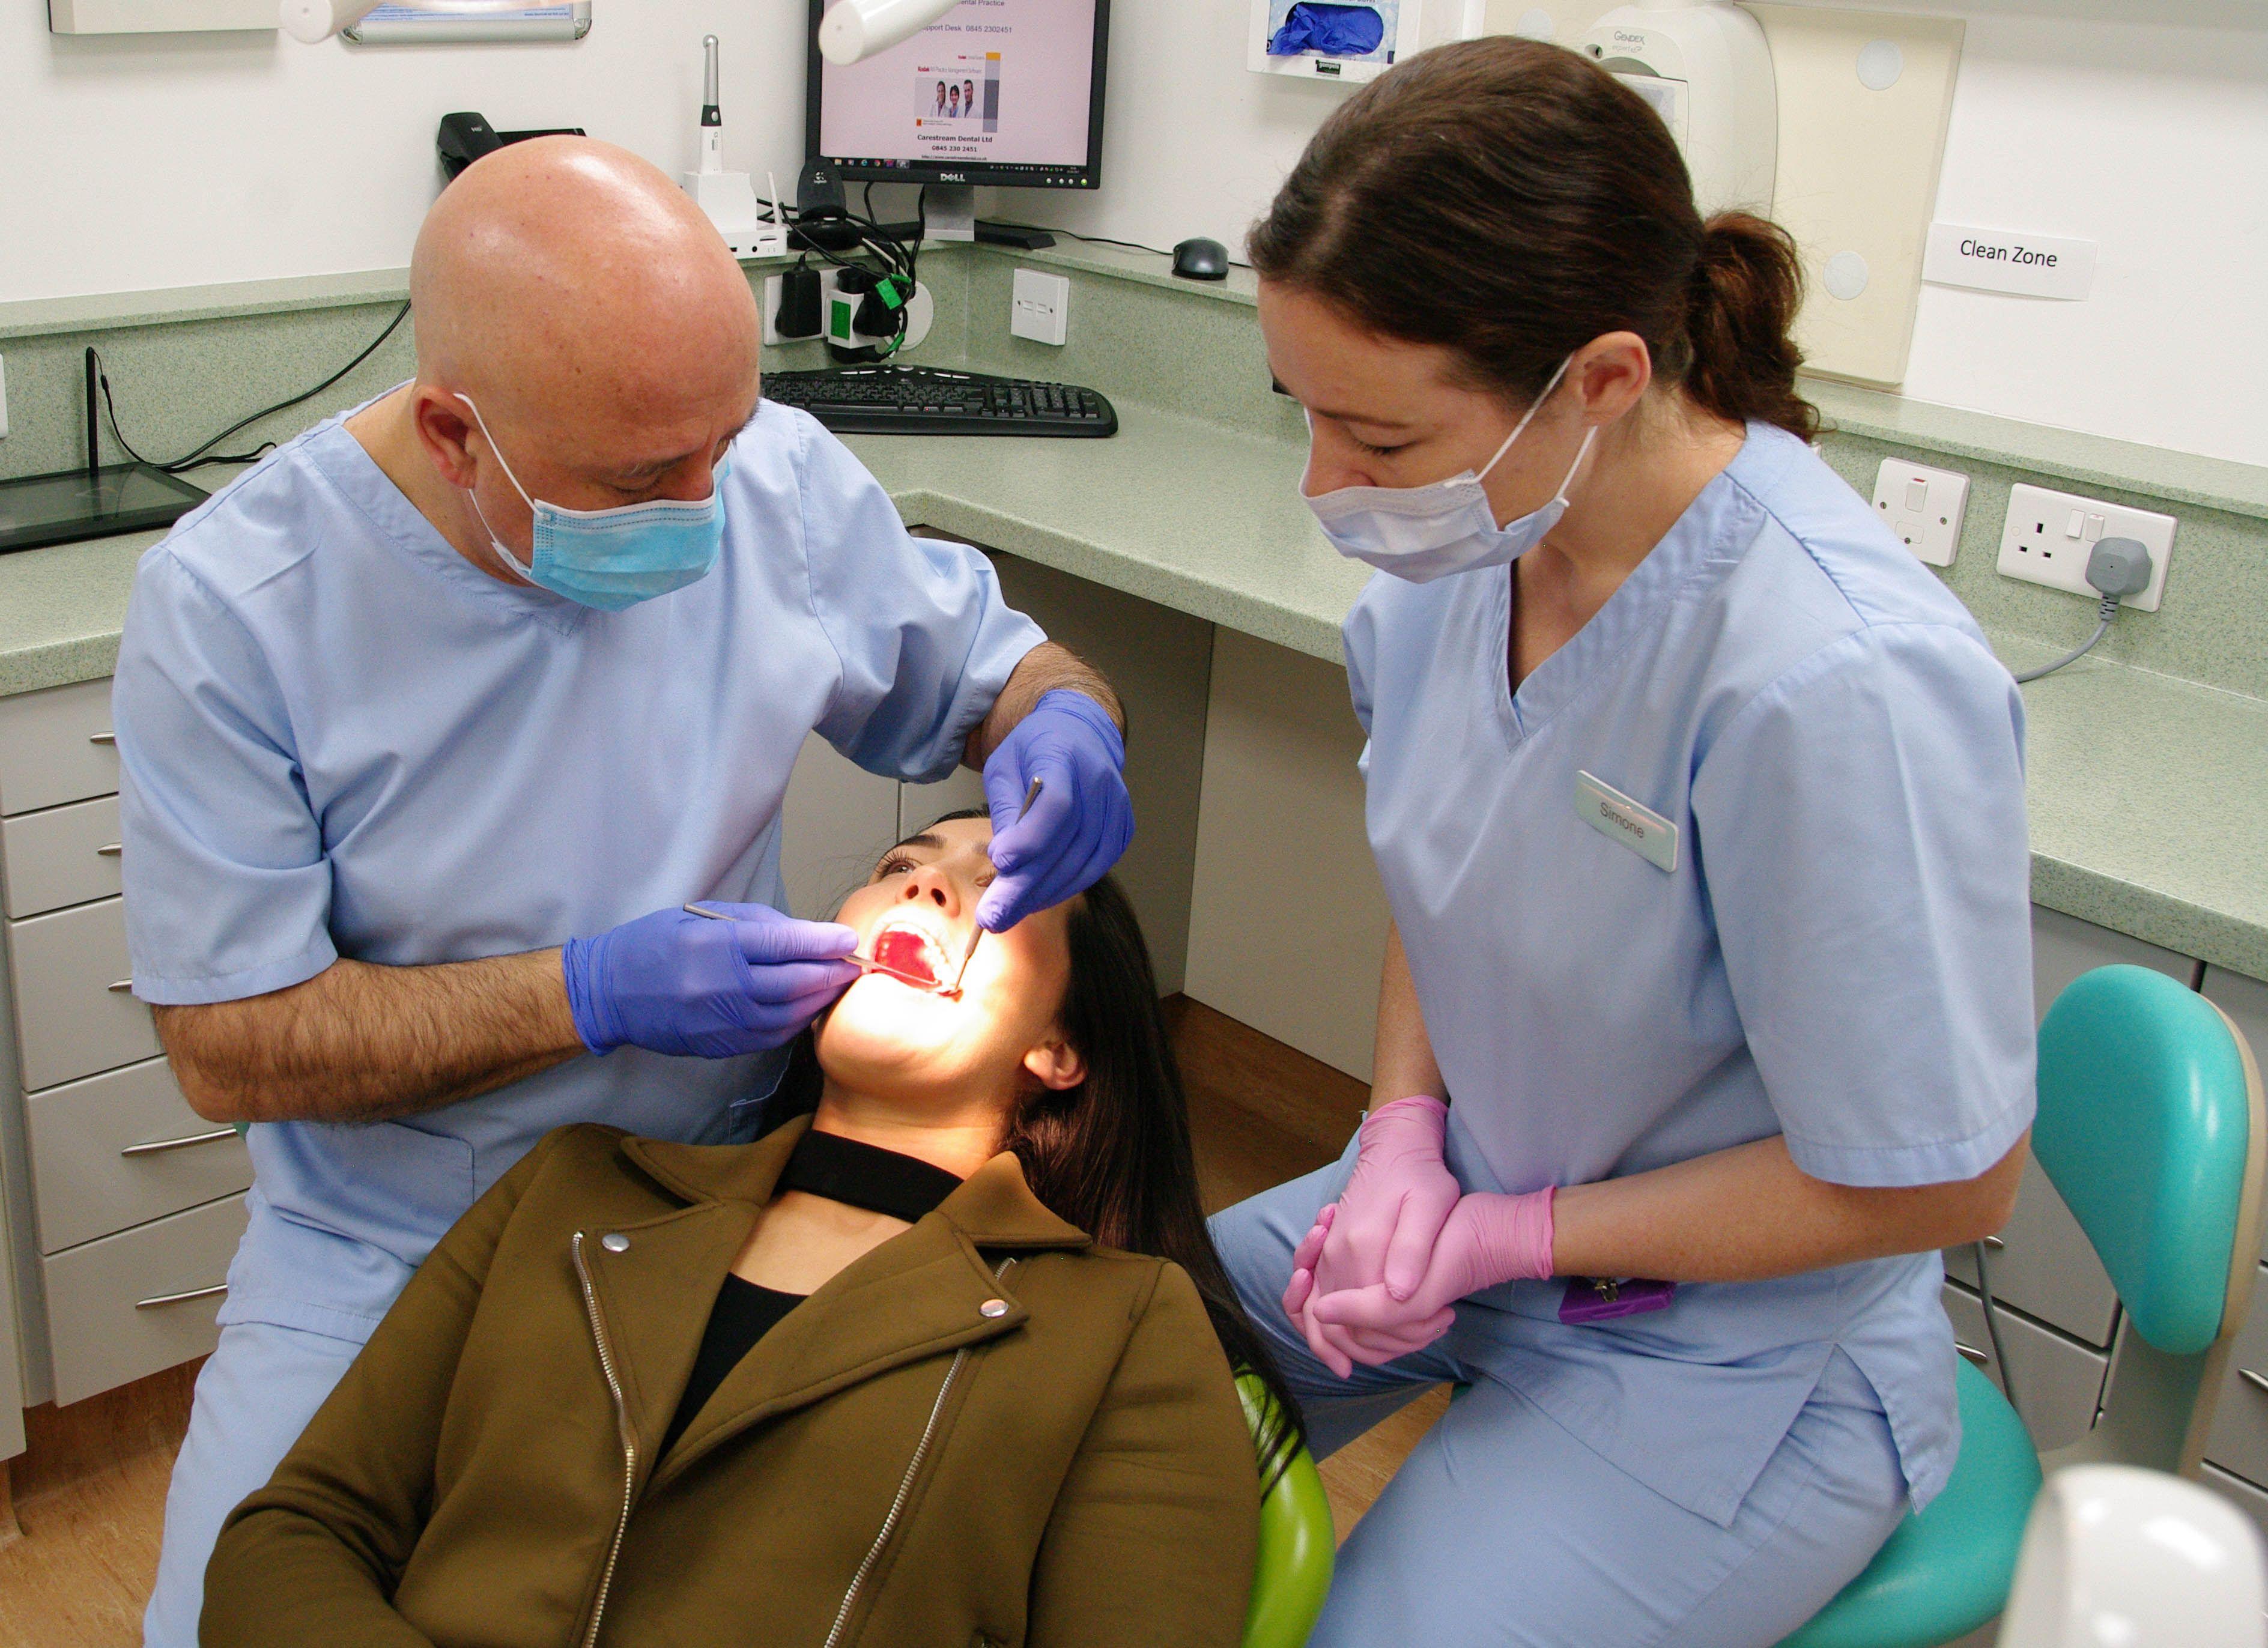 Harrow Dental 2327 High Street, Hornchurch Essex RM11 1TP